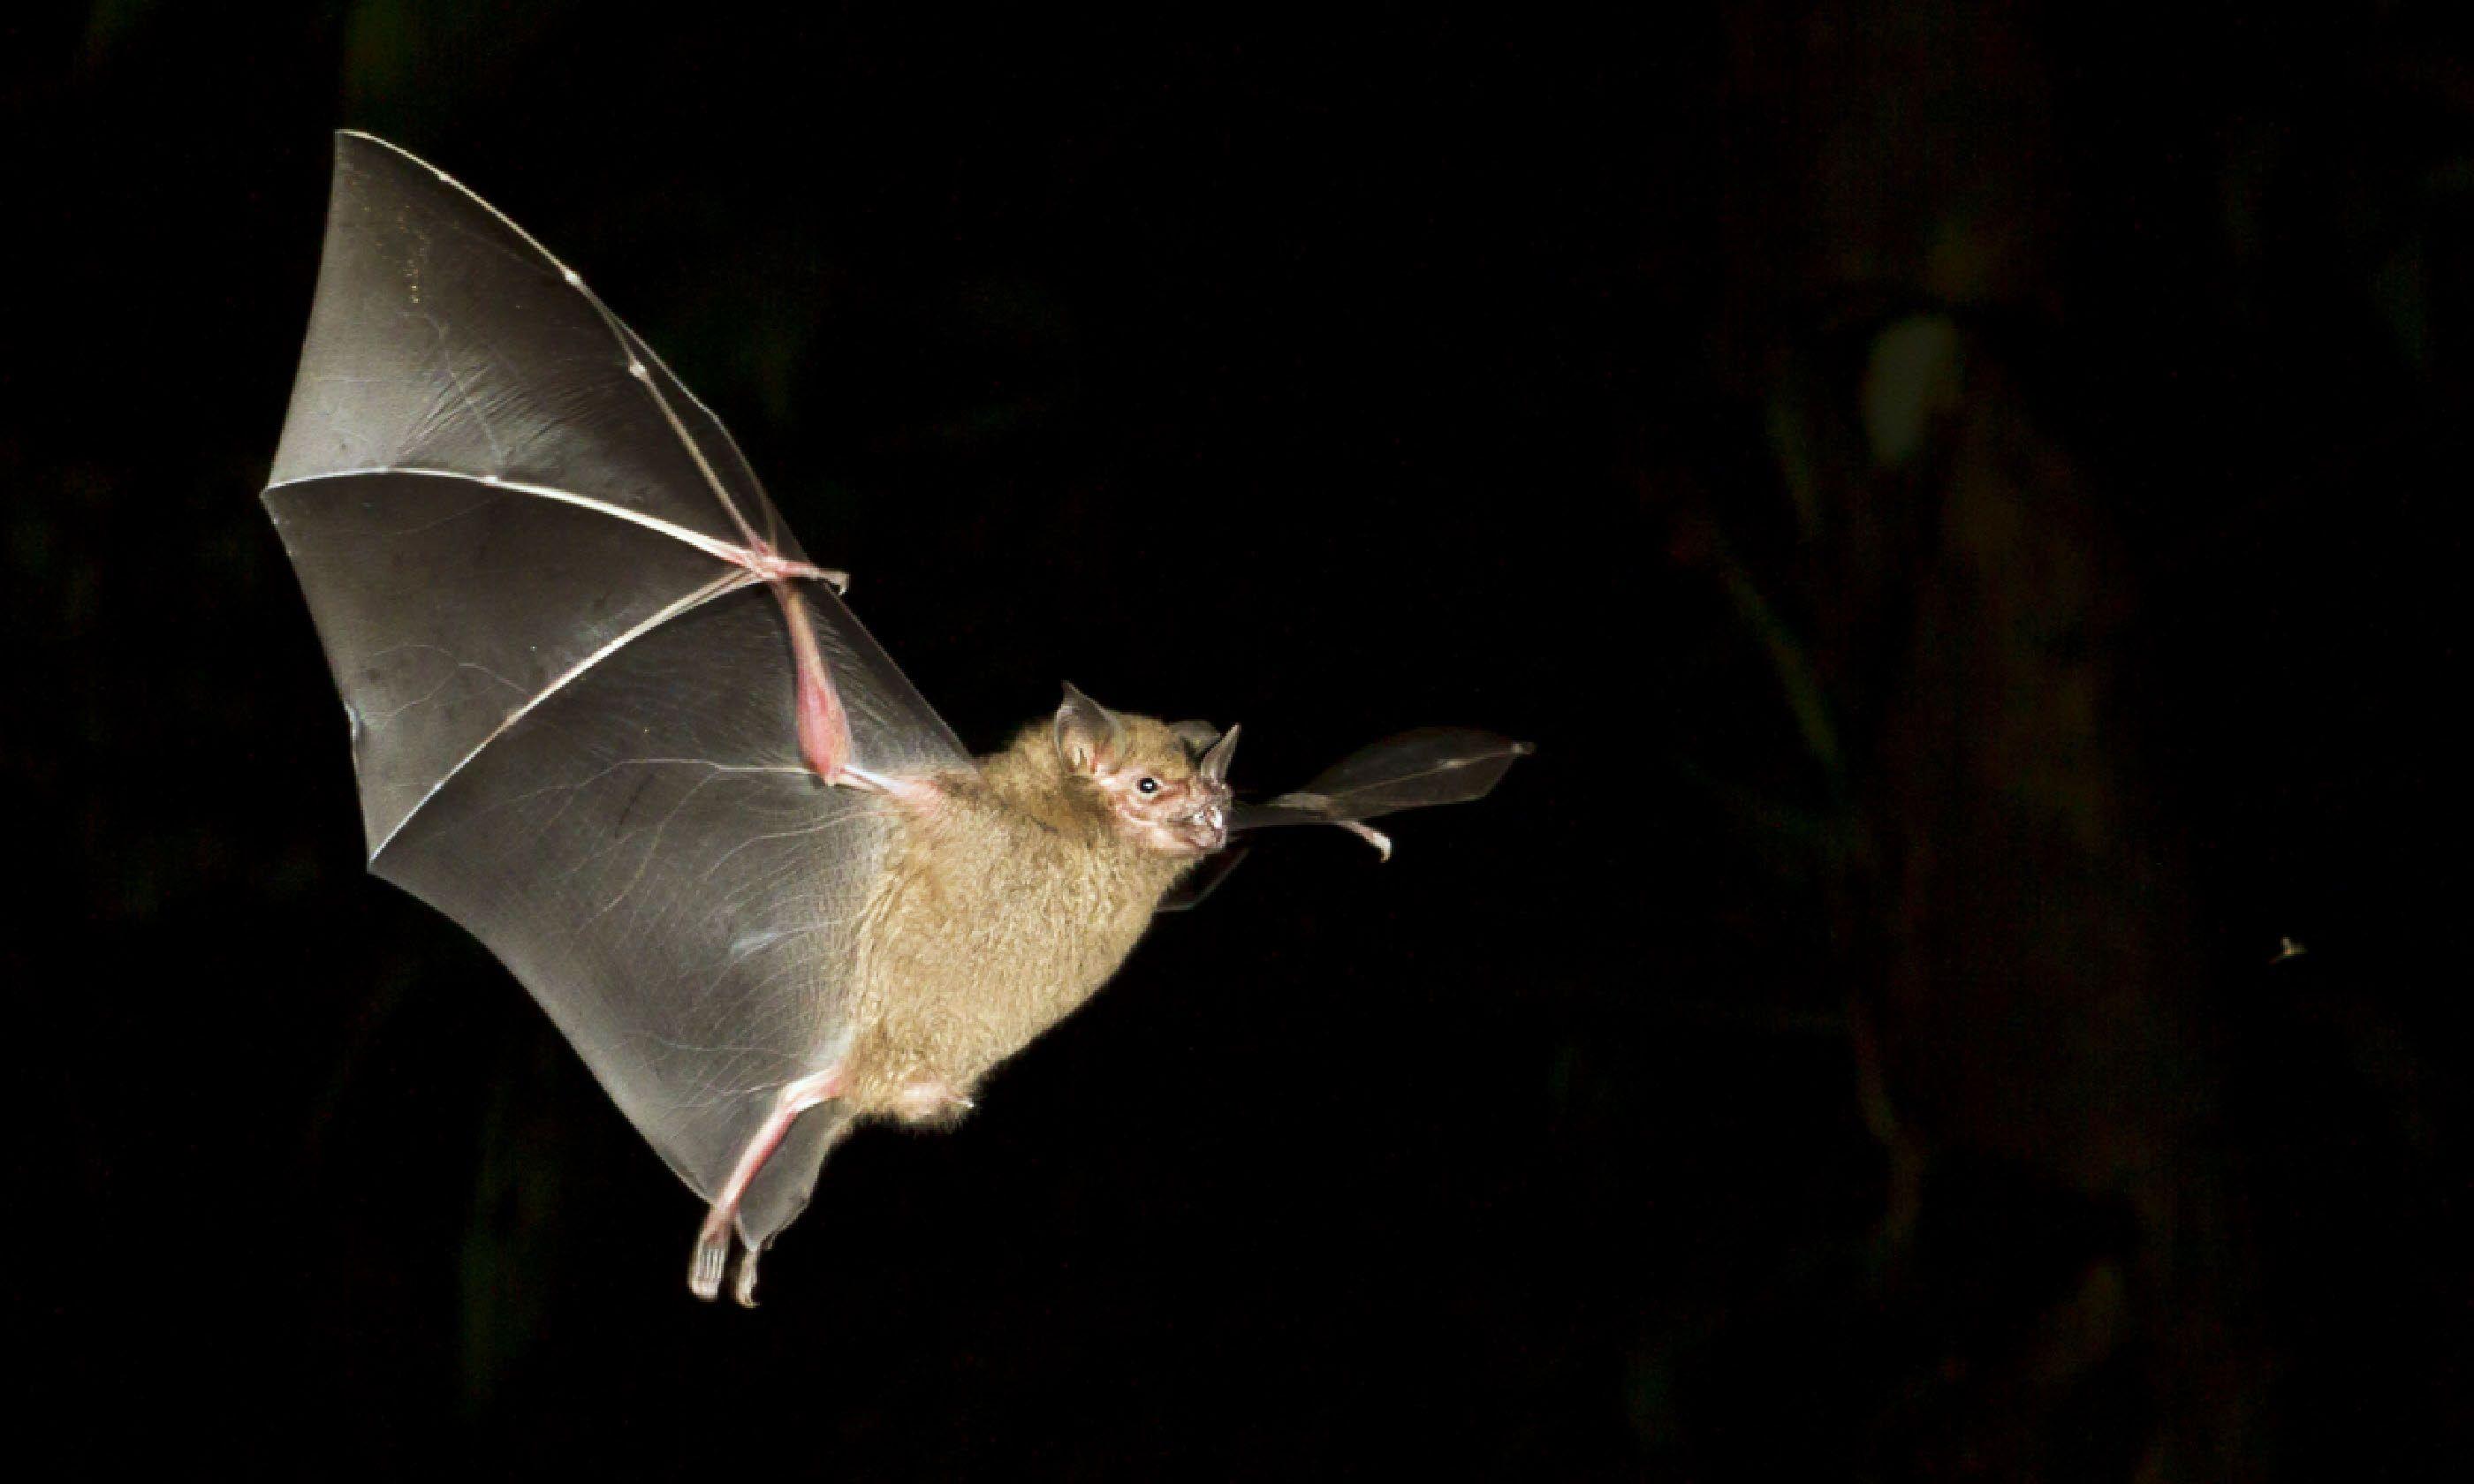 Fruit bat, Tortuguero (Shutterstock)